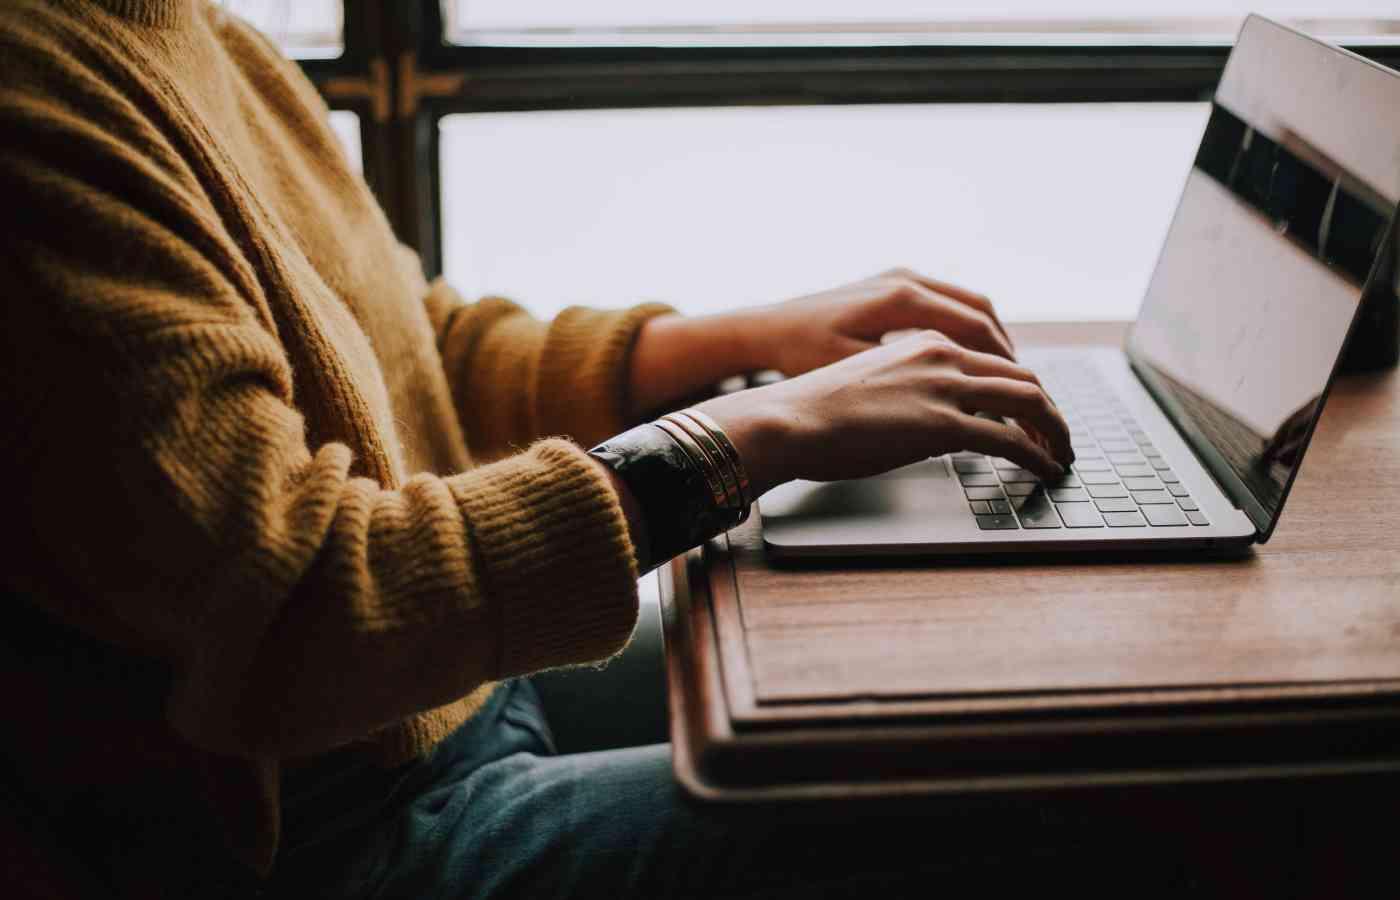 👨🏼💻 Startuvav online-kurs z vyvčennja IT dlja ljudej z invalidnistju